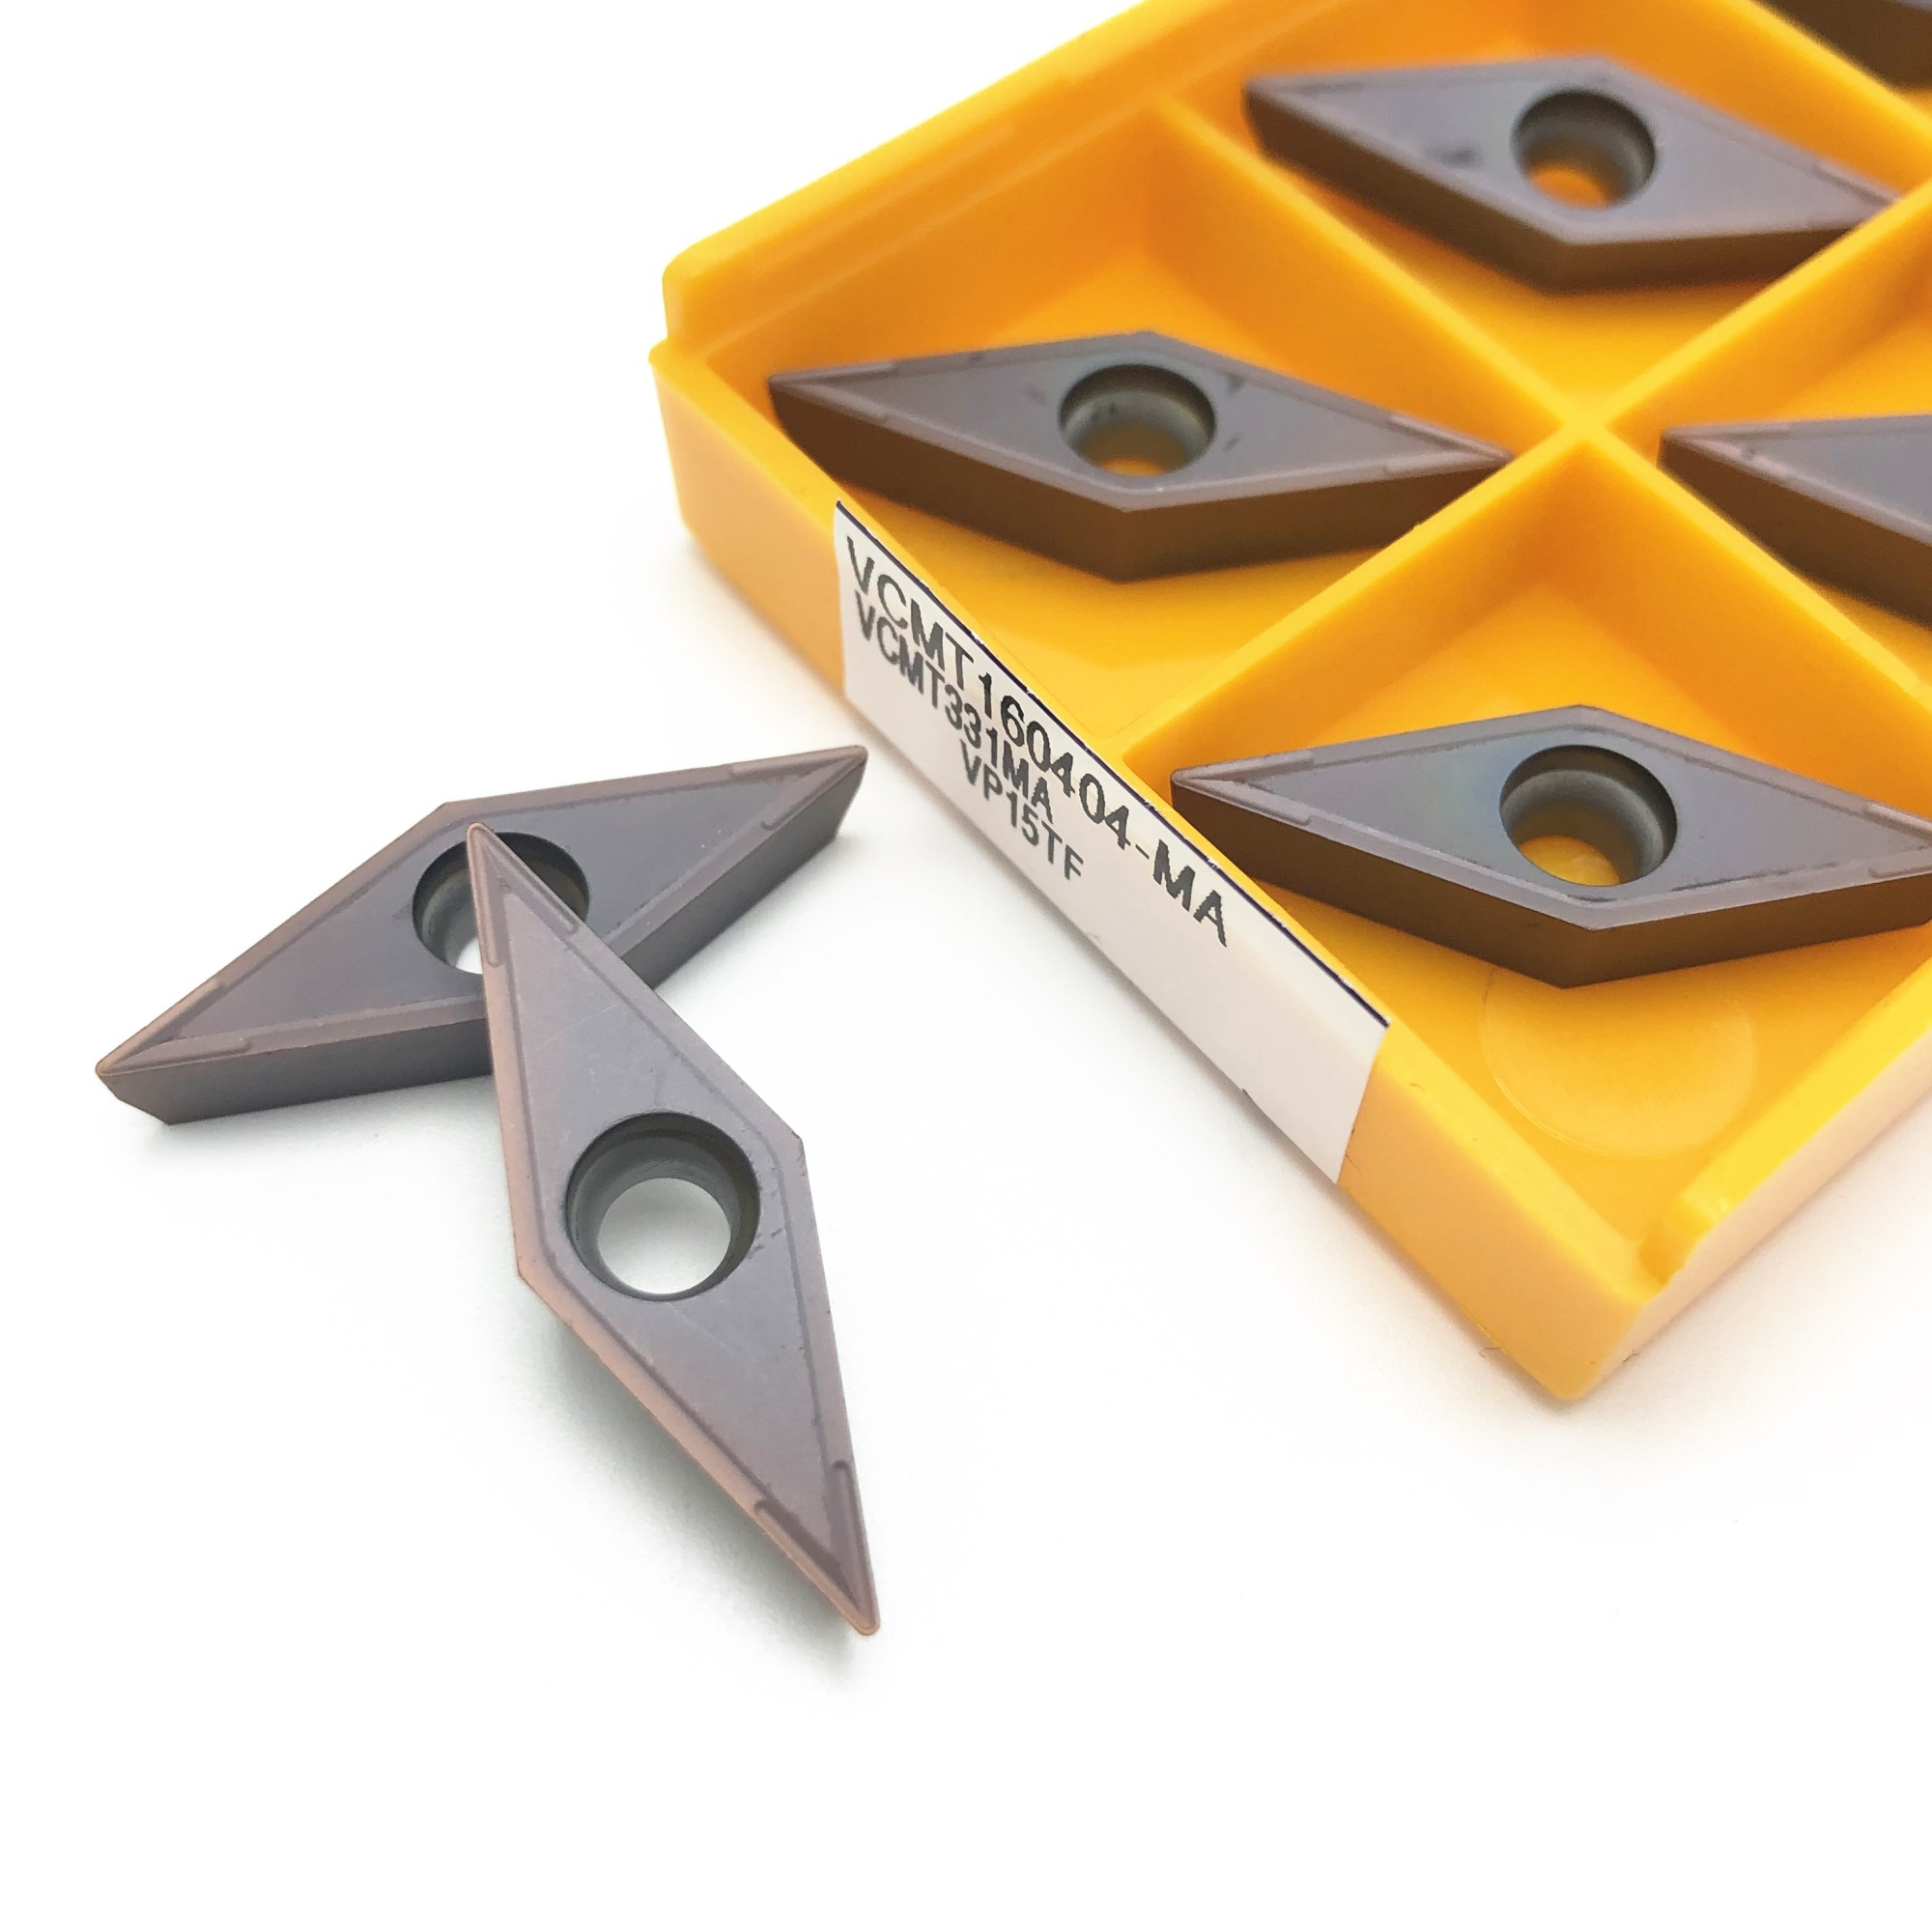 10PCS Carbide Insert VCMT160404 MA VP15TF UE6020 External Round Metal Milling Tool VCMT 160404 Lathe CNC Turning Tool VCMT160408